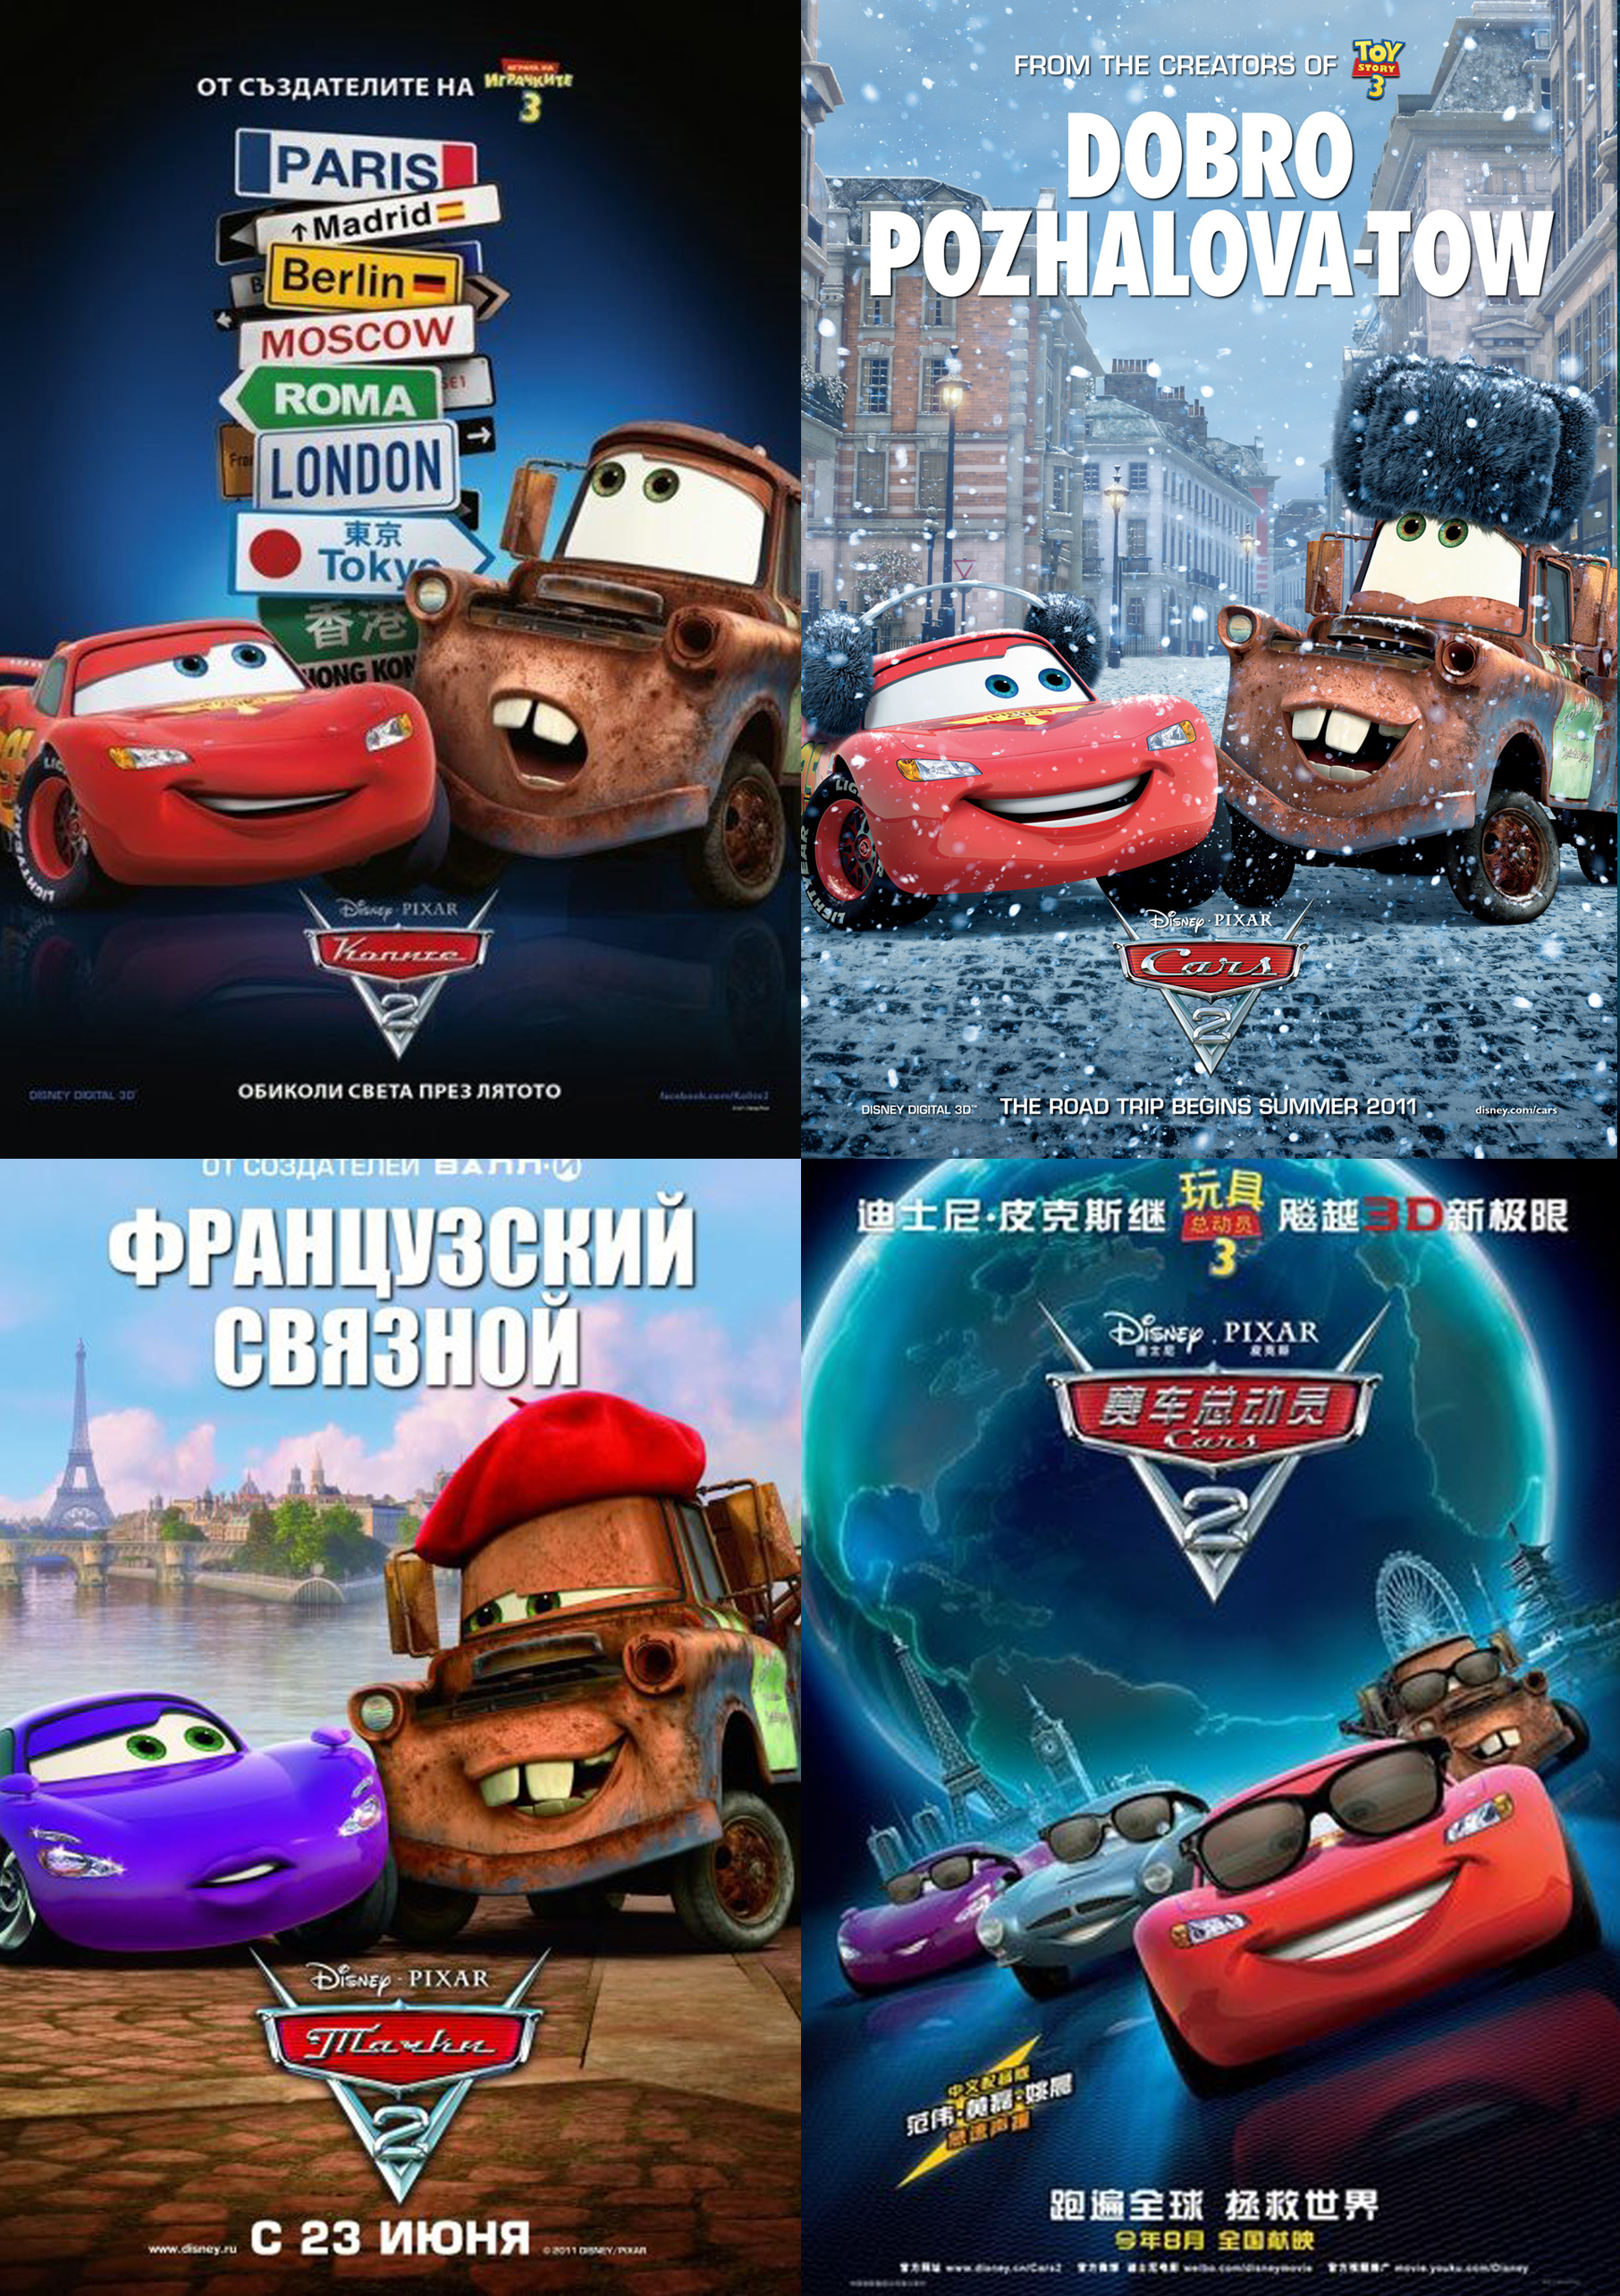 Cars 2, 2011.©Disney/Pixar.